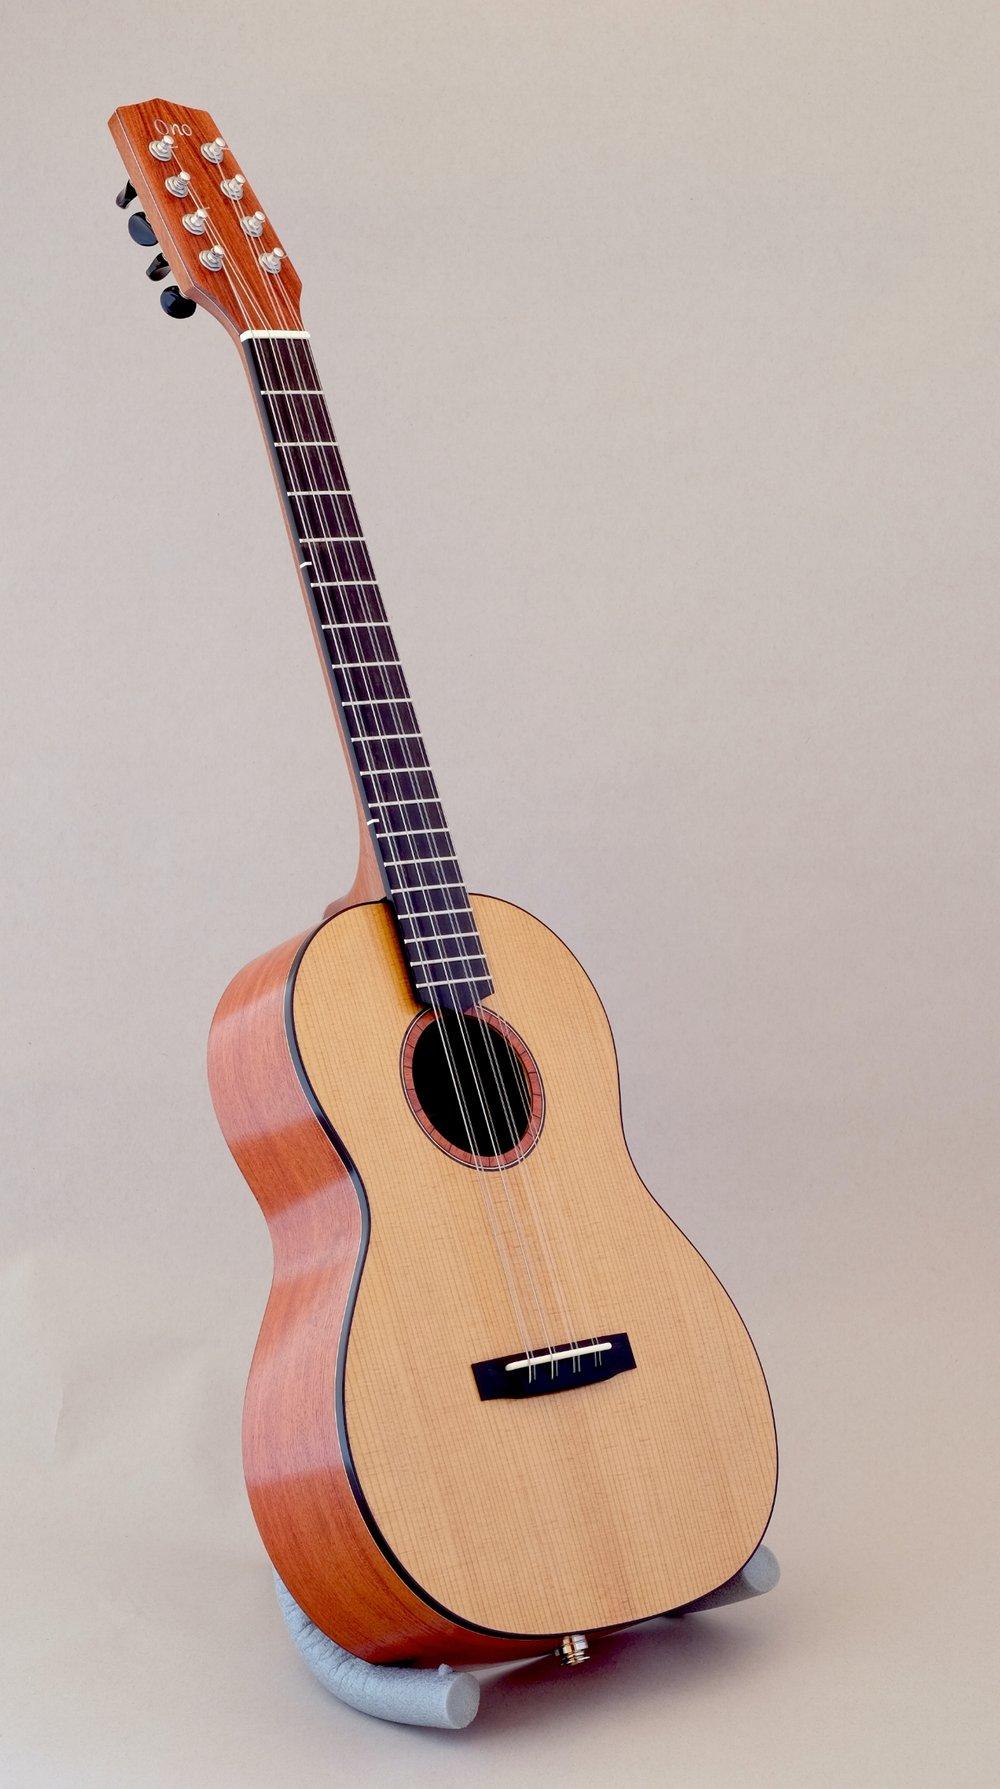 Padauk/Torrefied Sitka Spruce 8-string Baritone